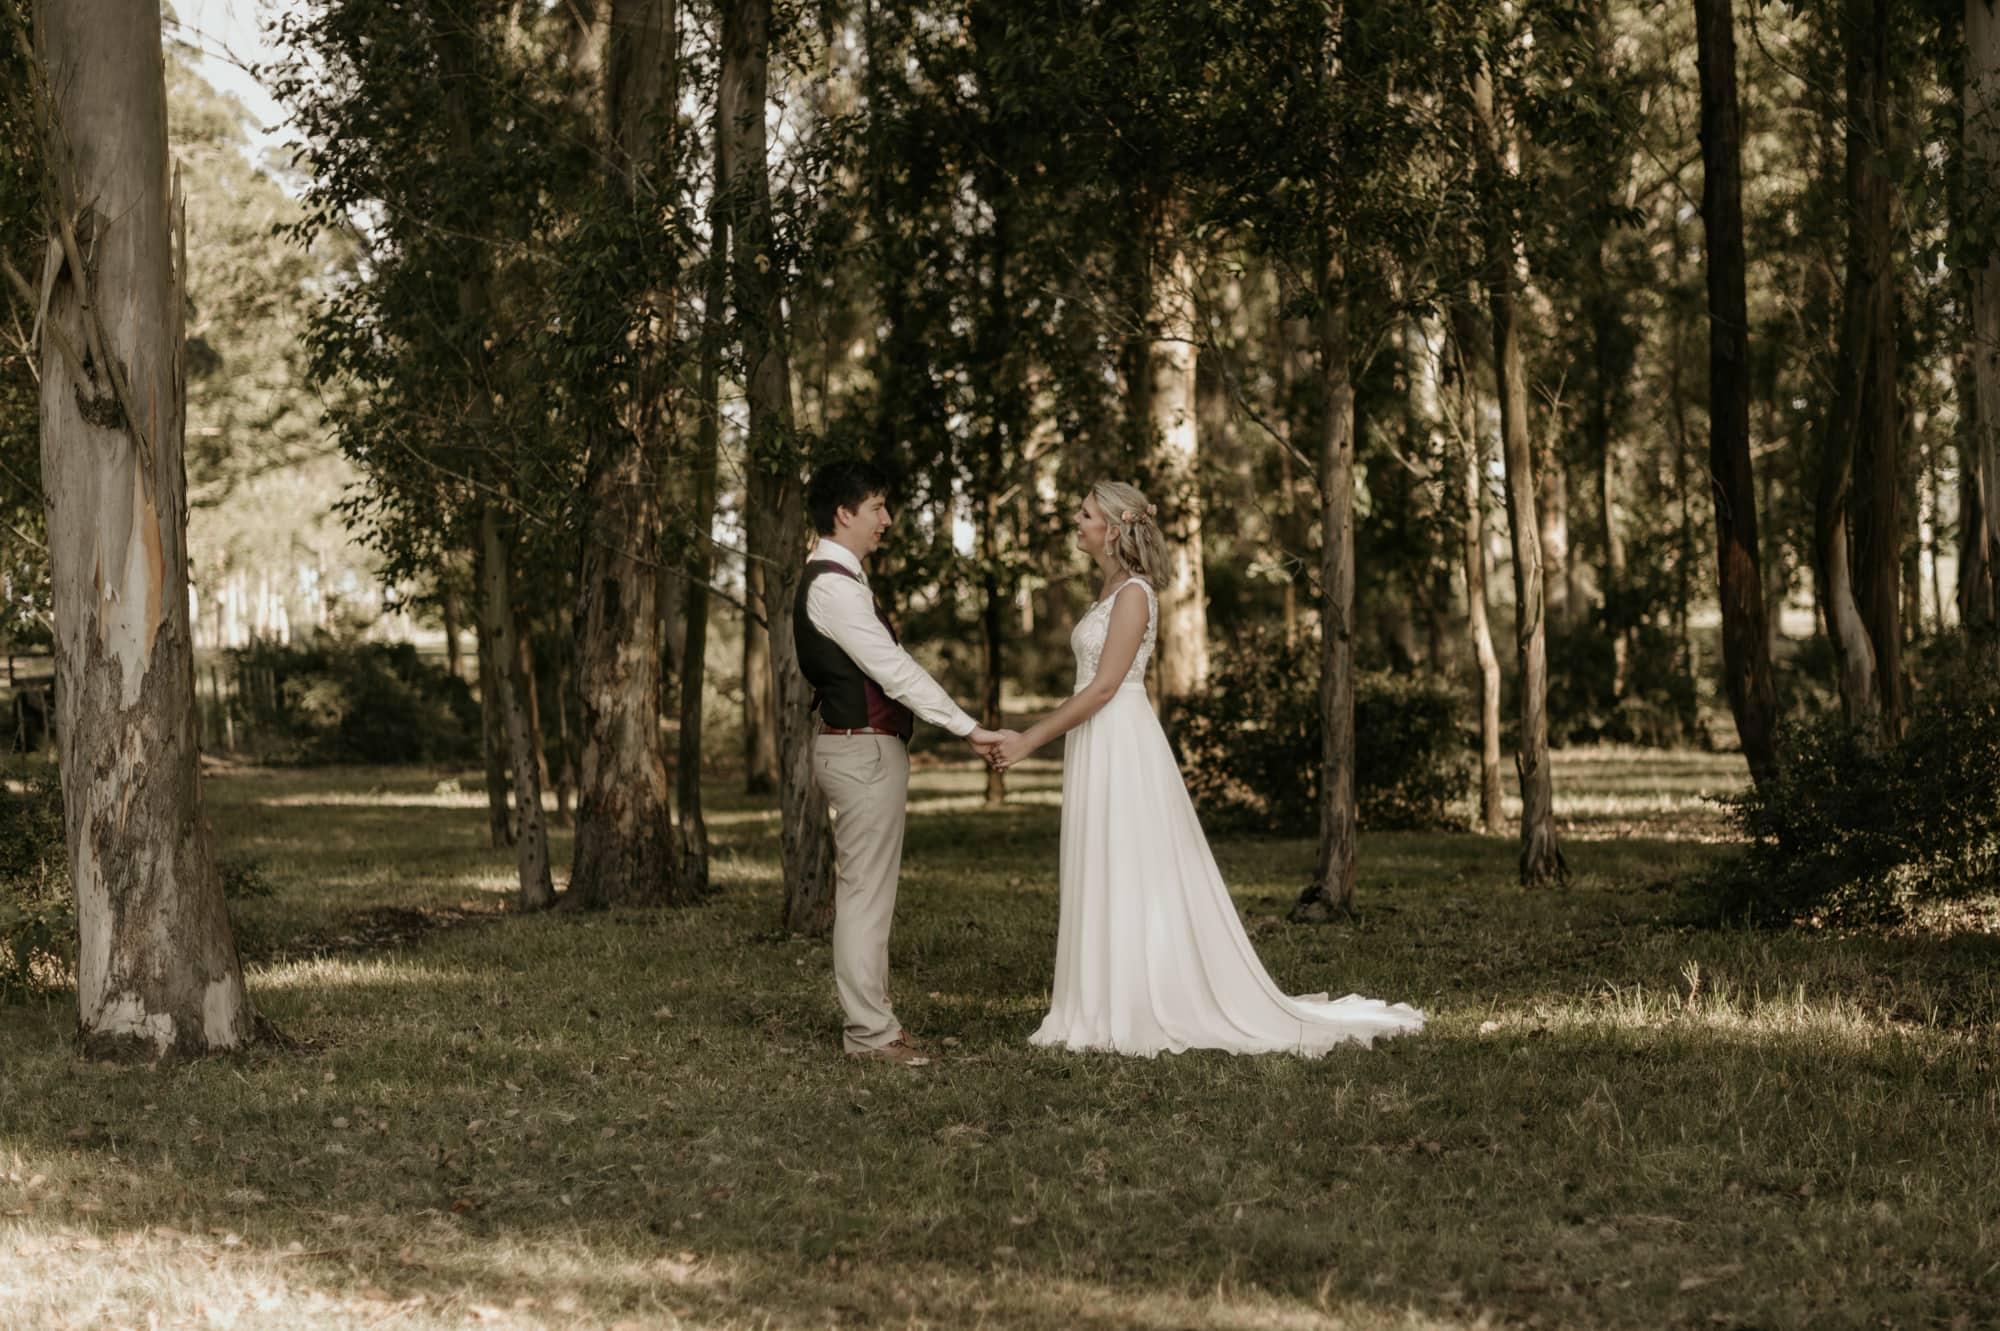 karien-daniel-oakhurst-wedding-June-Richards-Photography-Destination-Weddings-Elopements-Garden-Route-27_1